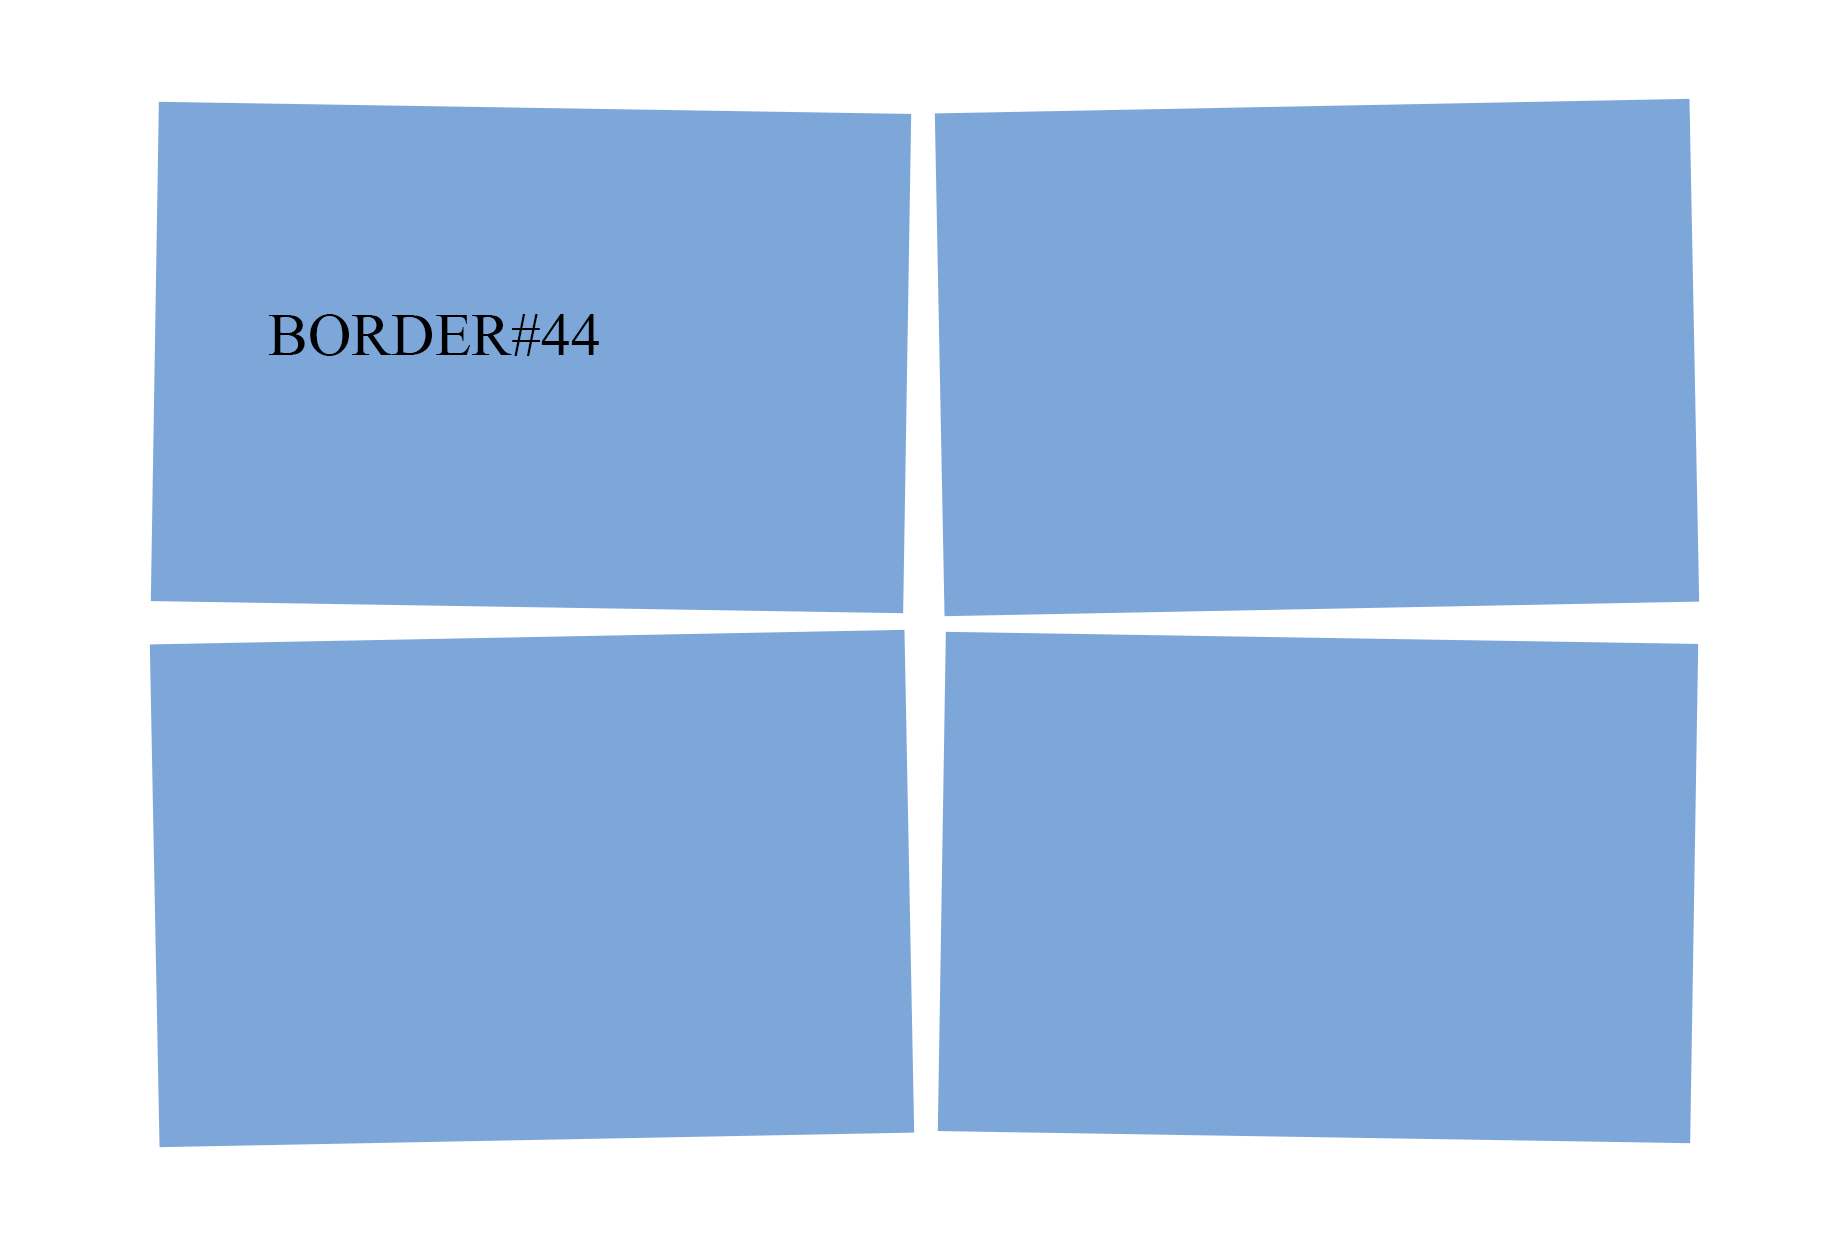 Border#44